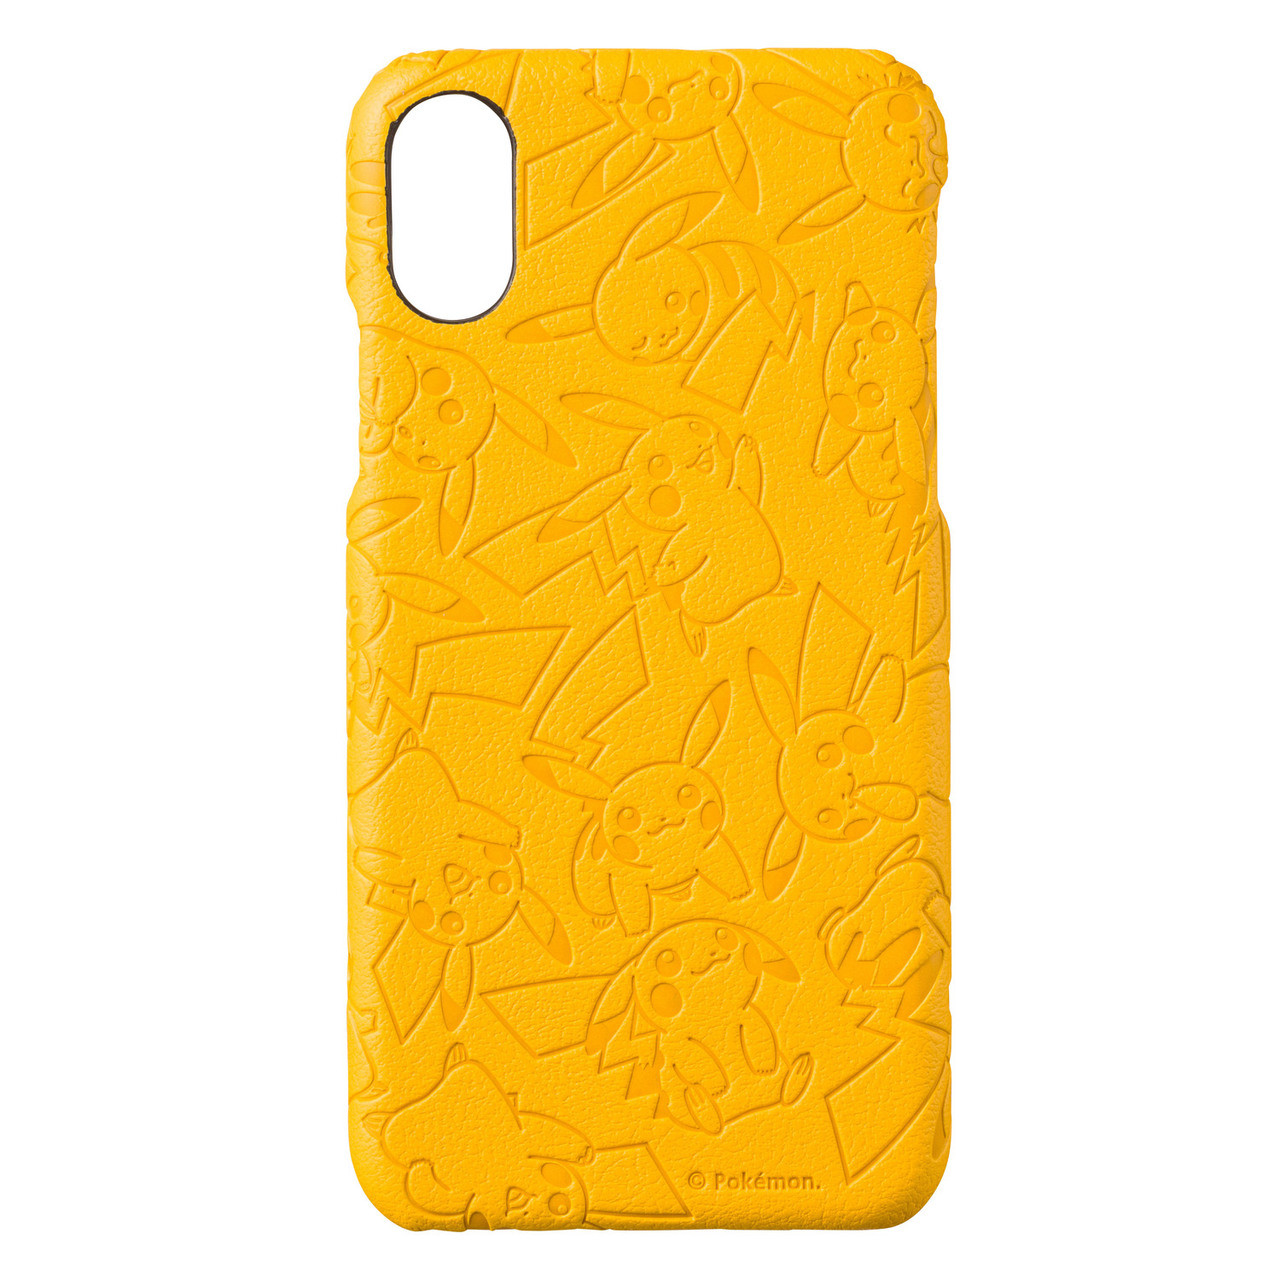 X Pikachu Pokemon Center Original card flap case for iPhone Xs